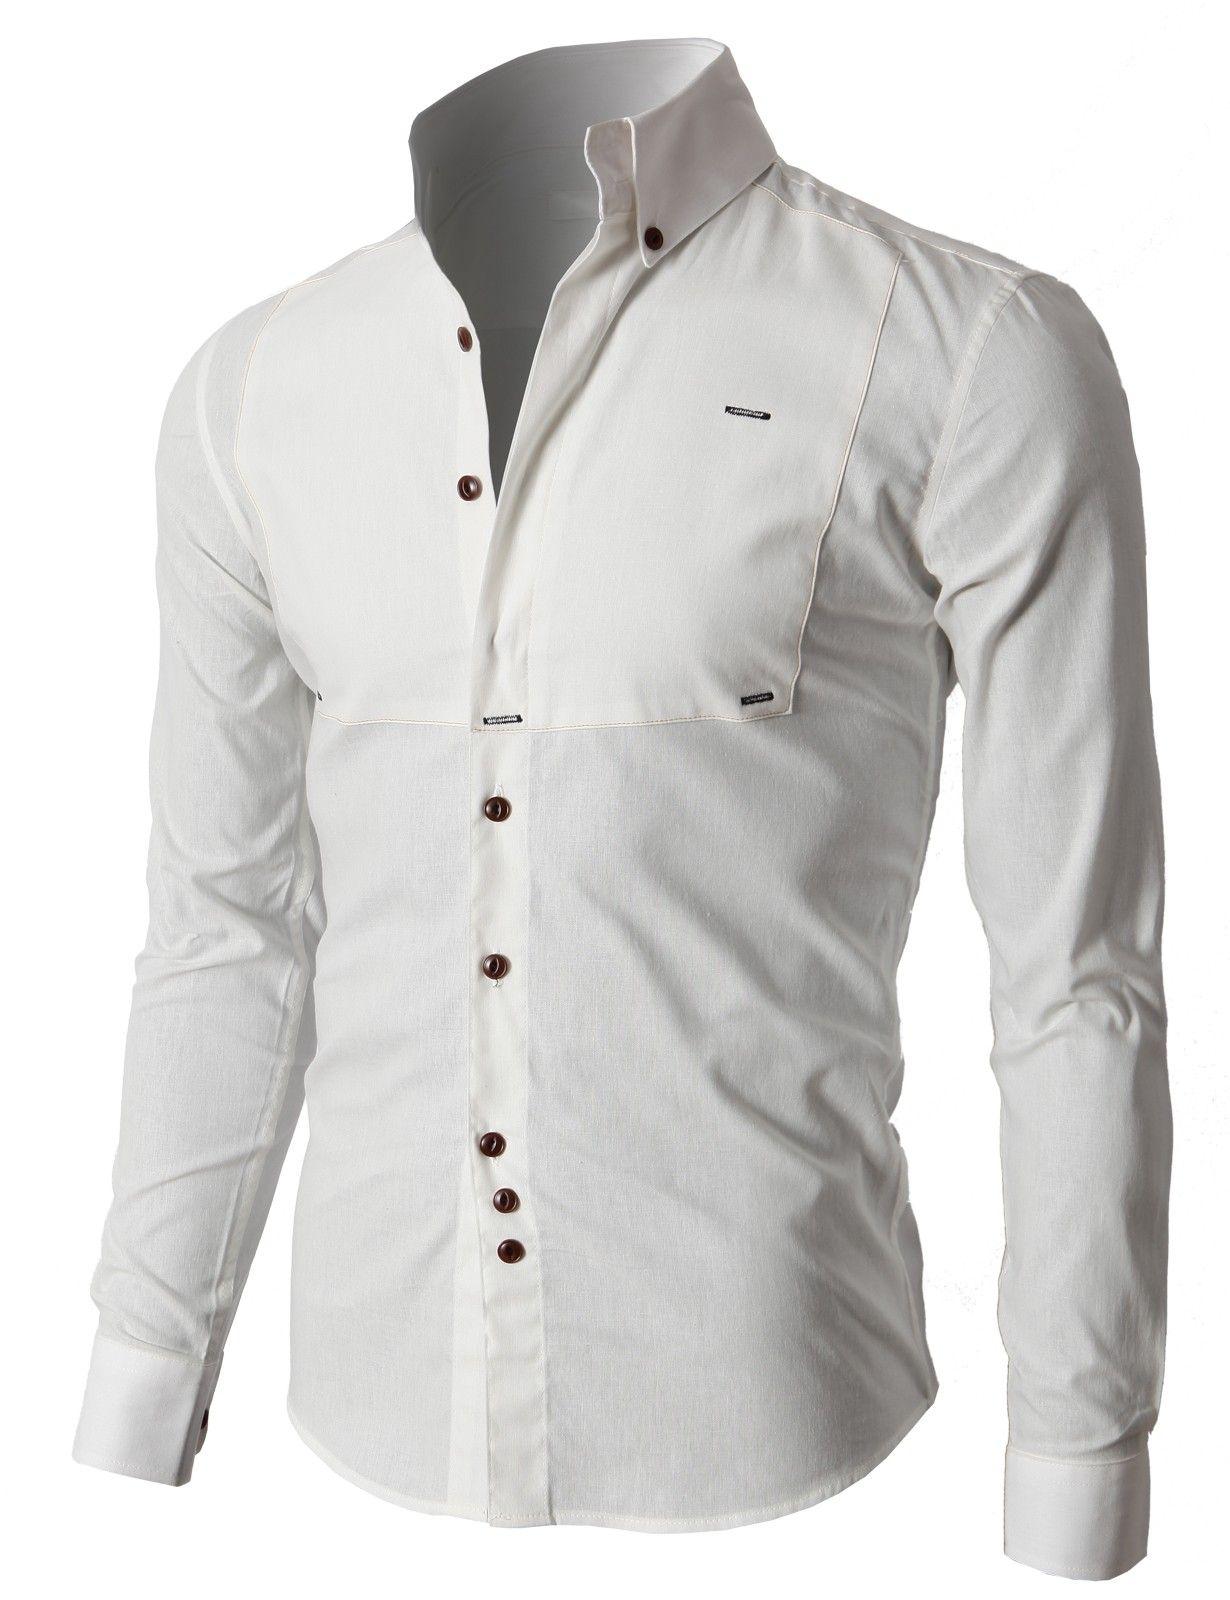 2661c61ff50 Doublju Premium Slim Fit Designed Button-down Shirts (KMTSTL0218)  doublju